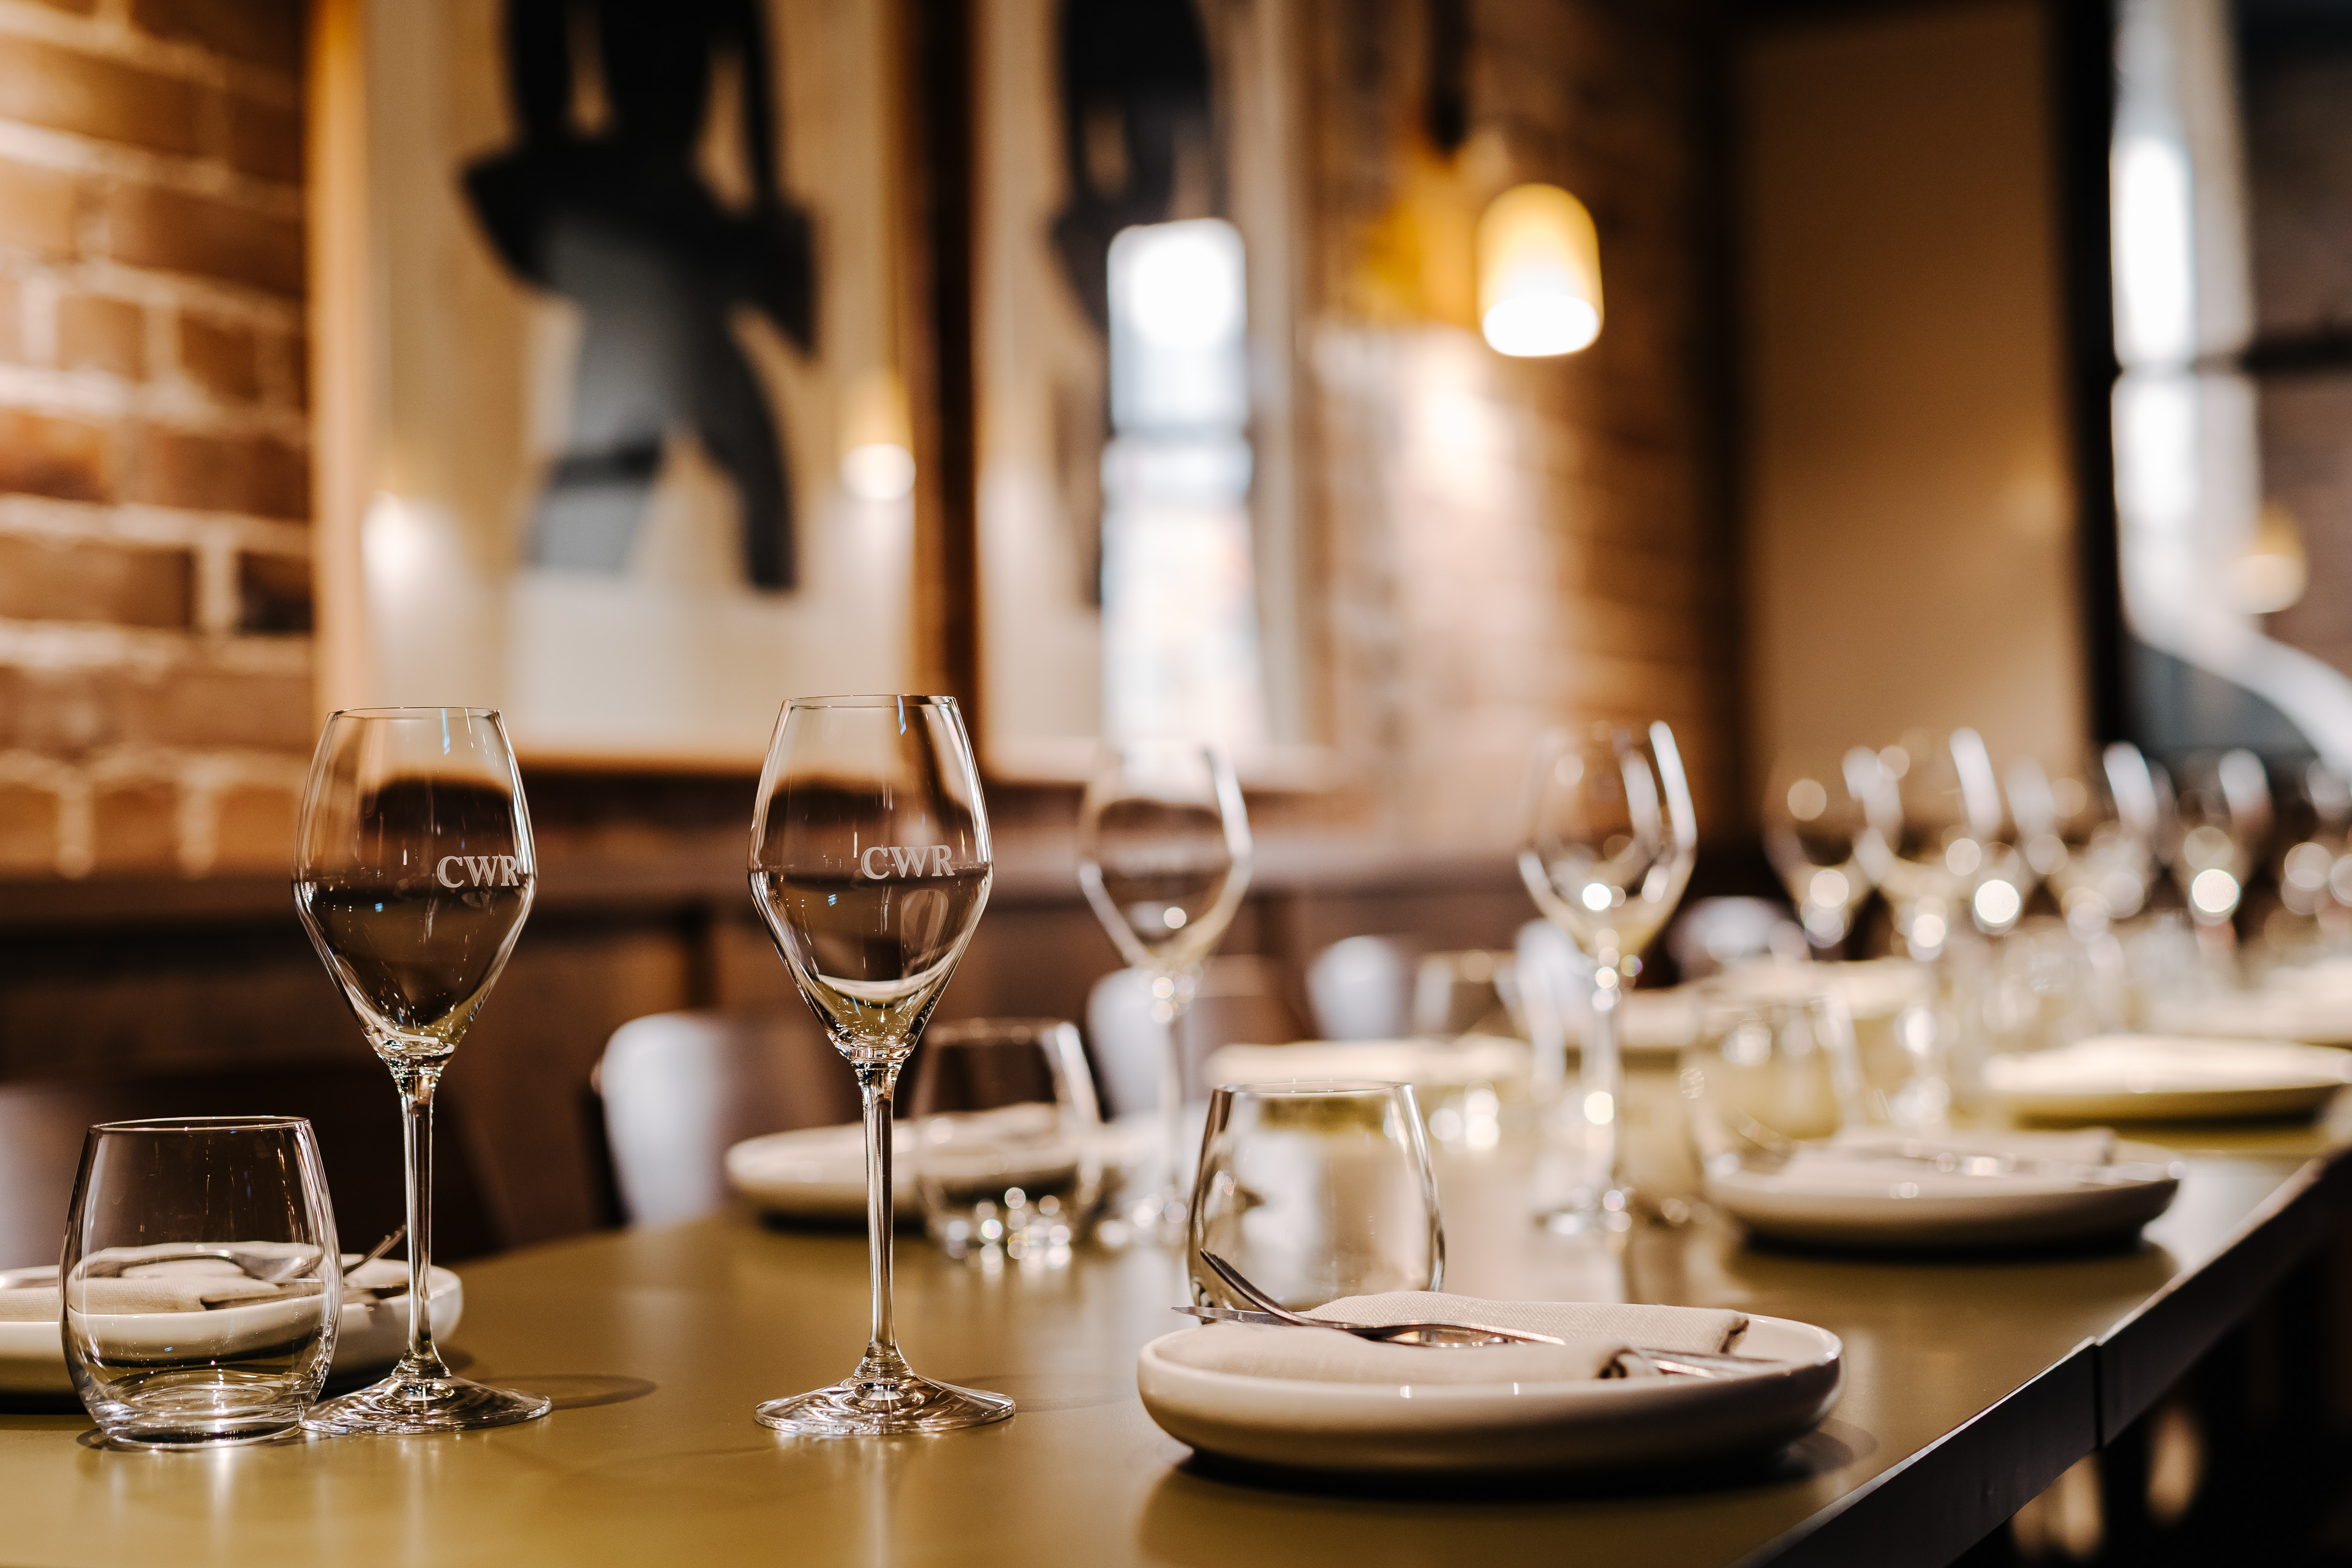 sydney design social coogee wine room logo branding glassware